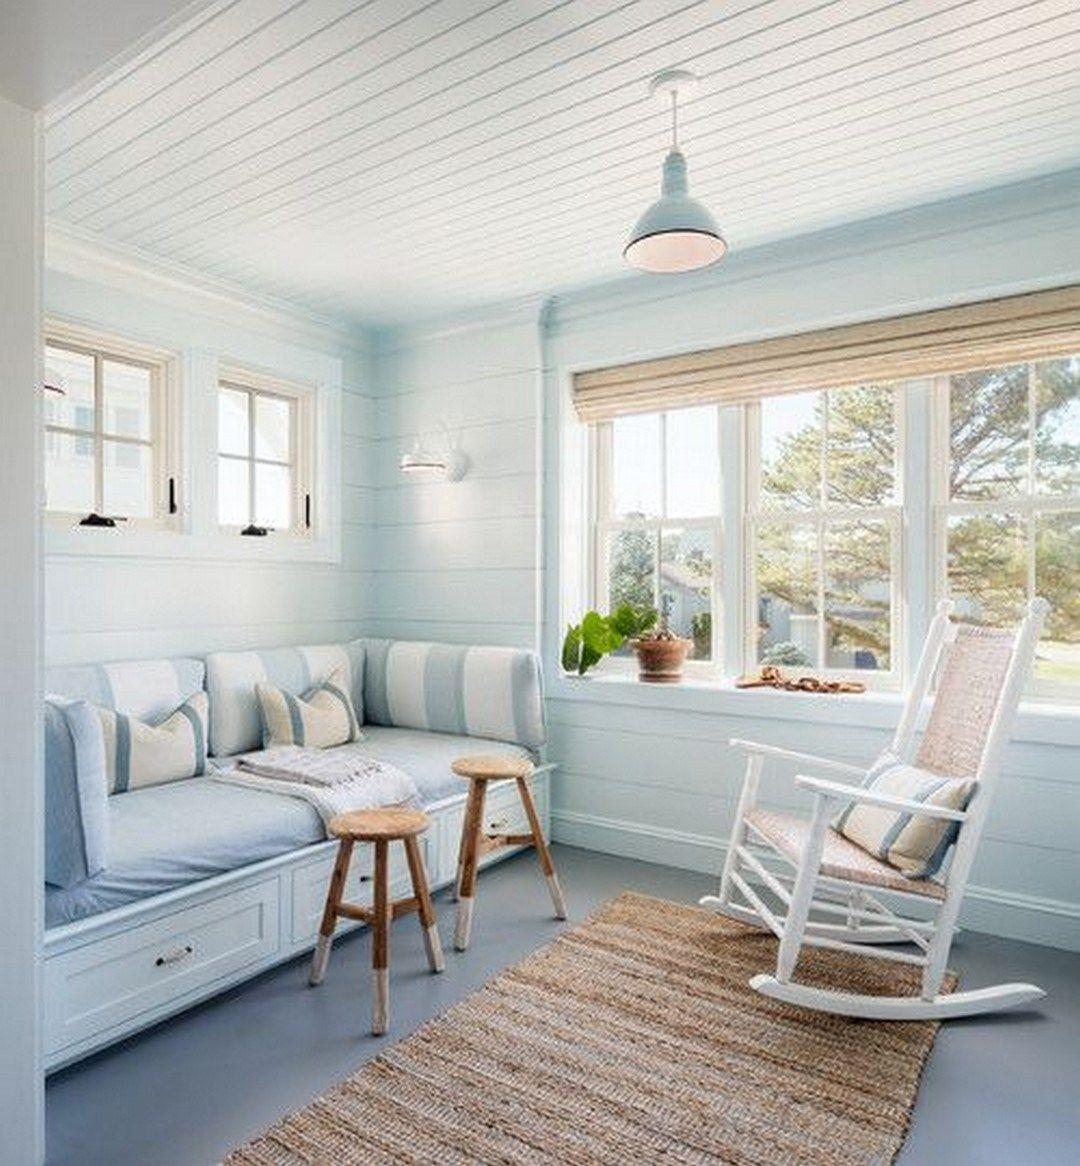 Interior Sunroom Addition Ideas: Cozy Modern Farmhouse Sunroom Design Ideas (35)